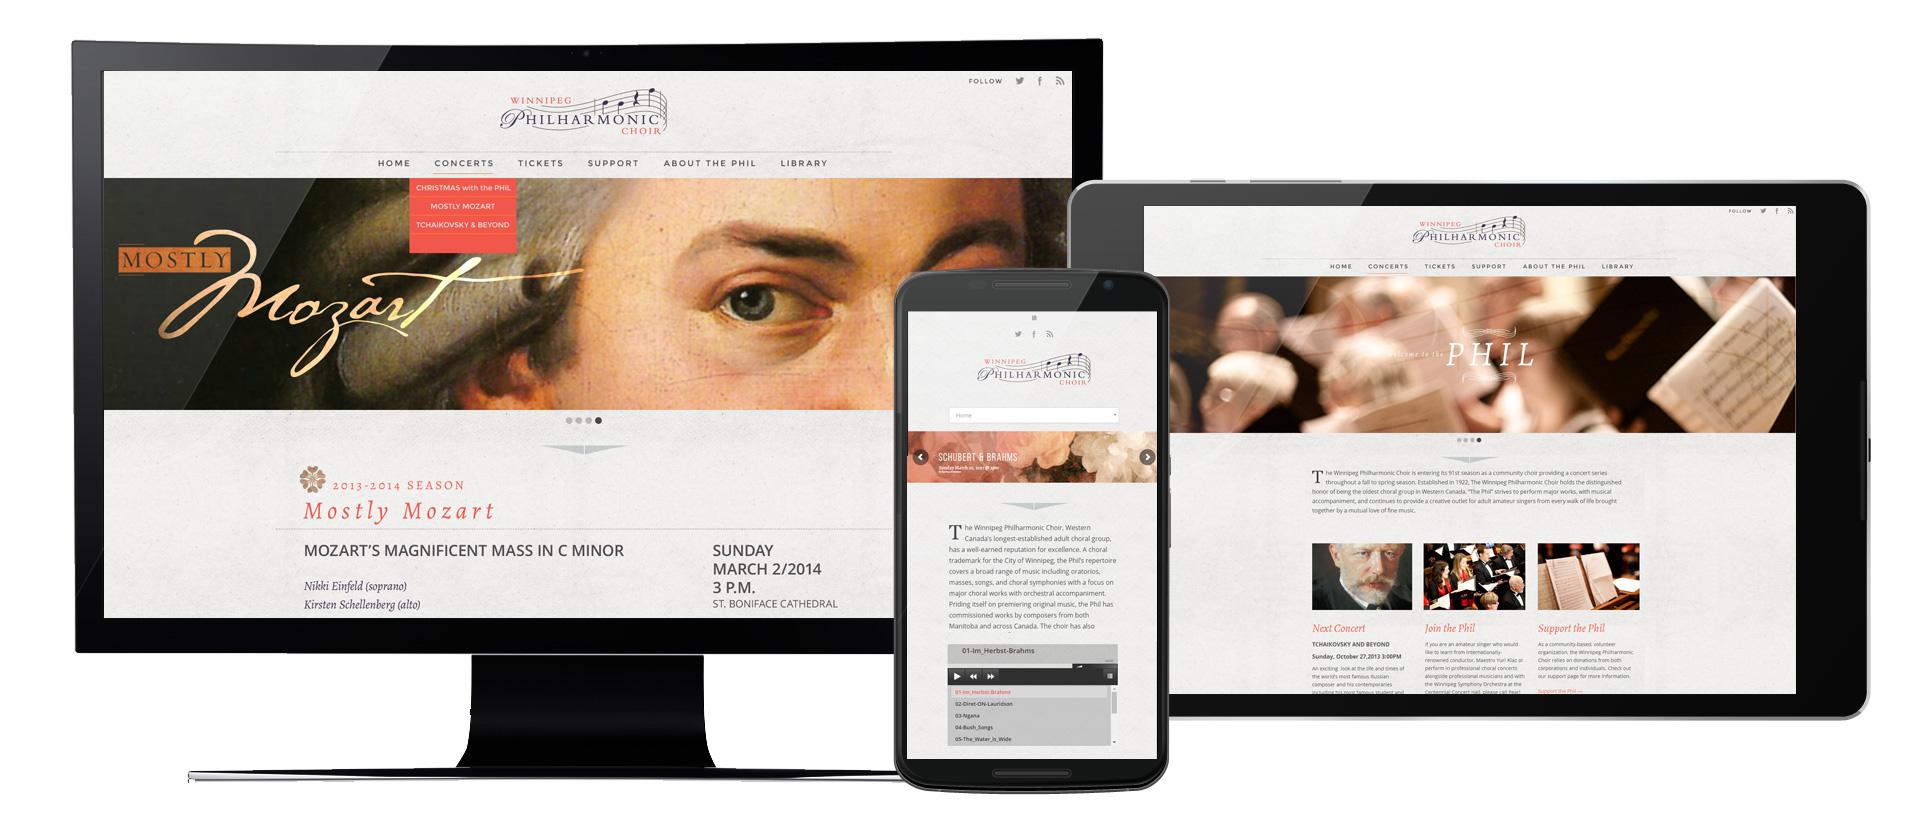 Winnipeg Philharmonic Choir Website